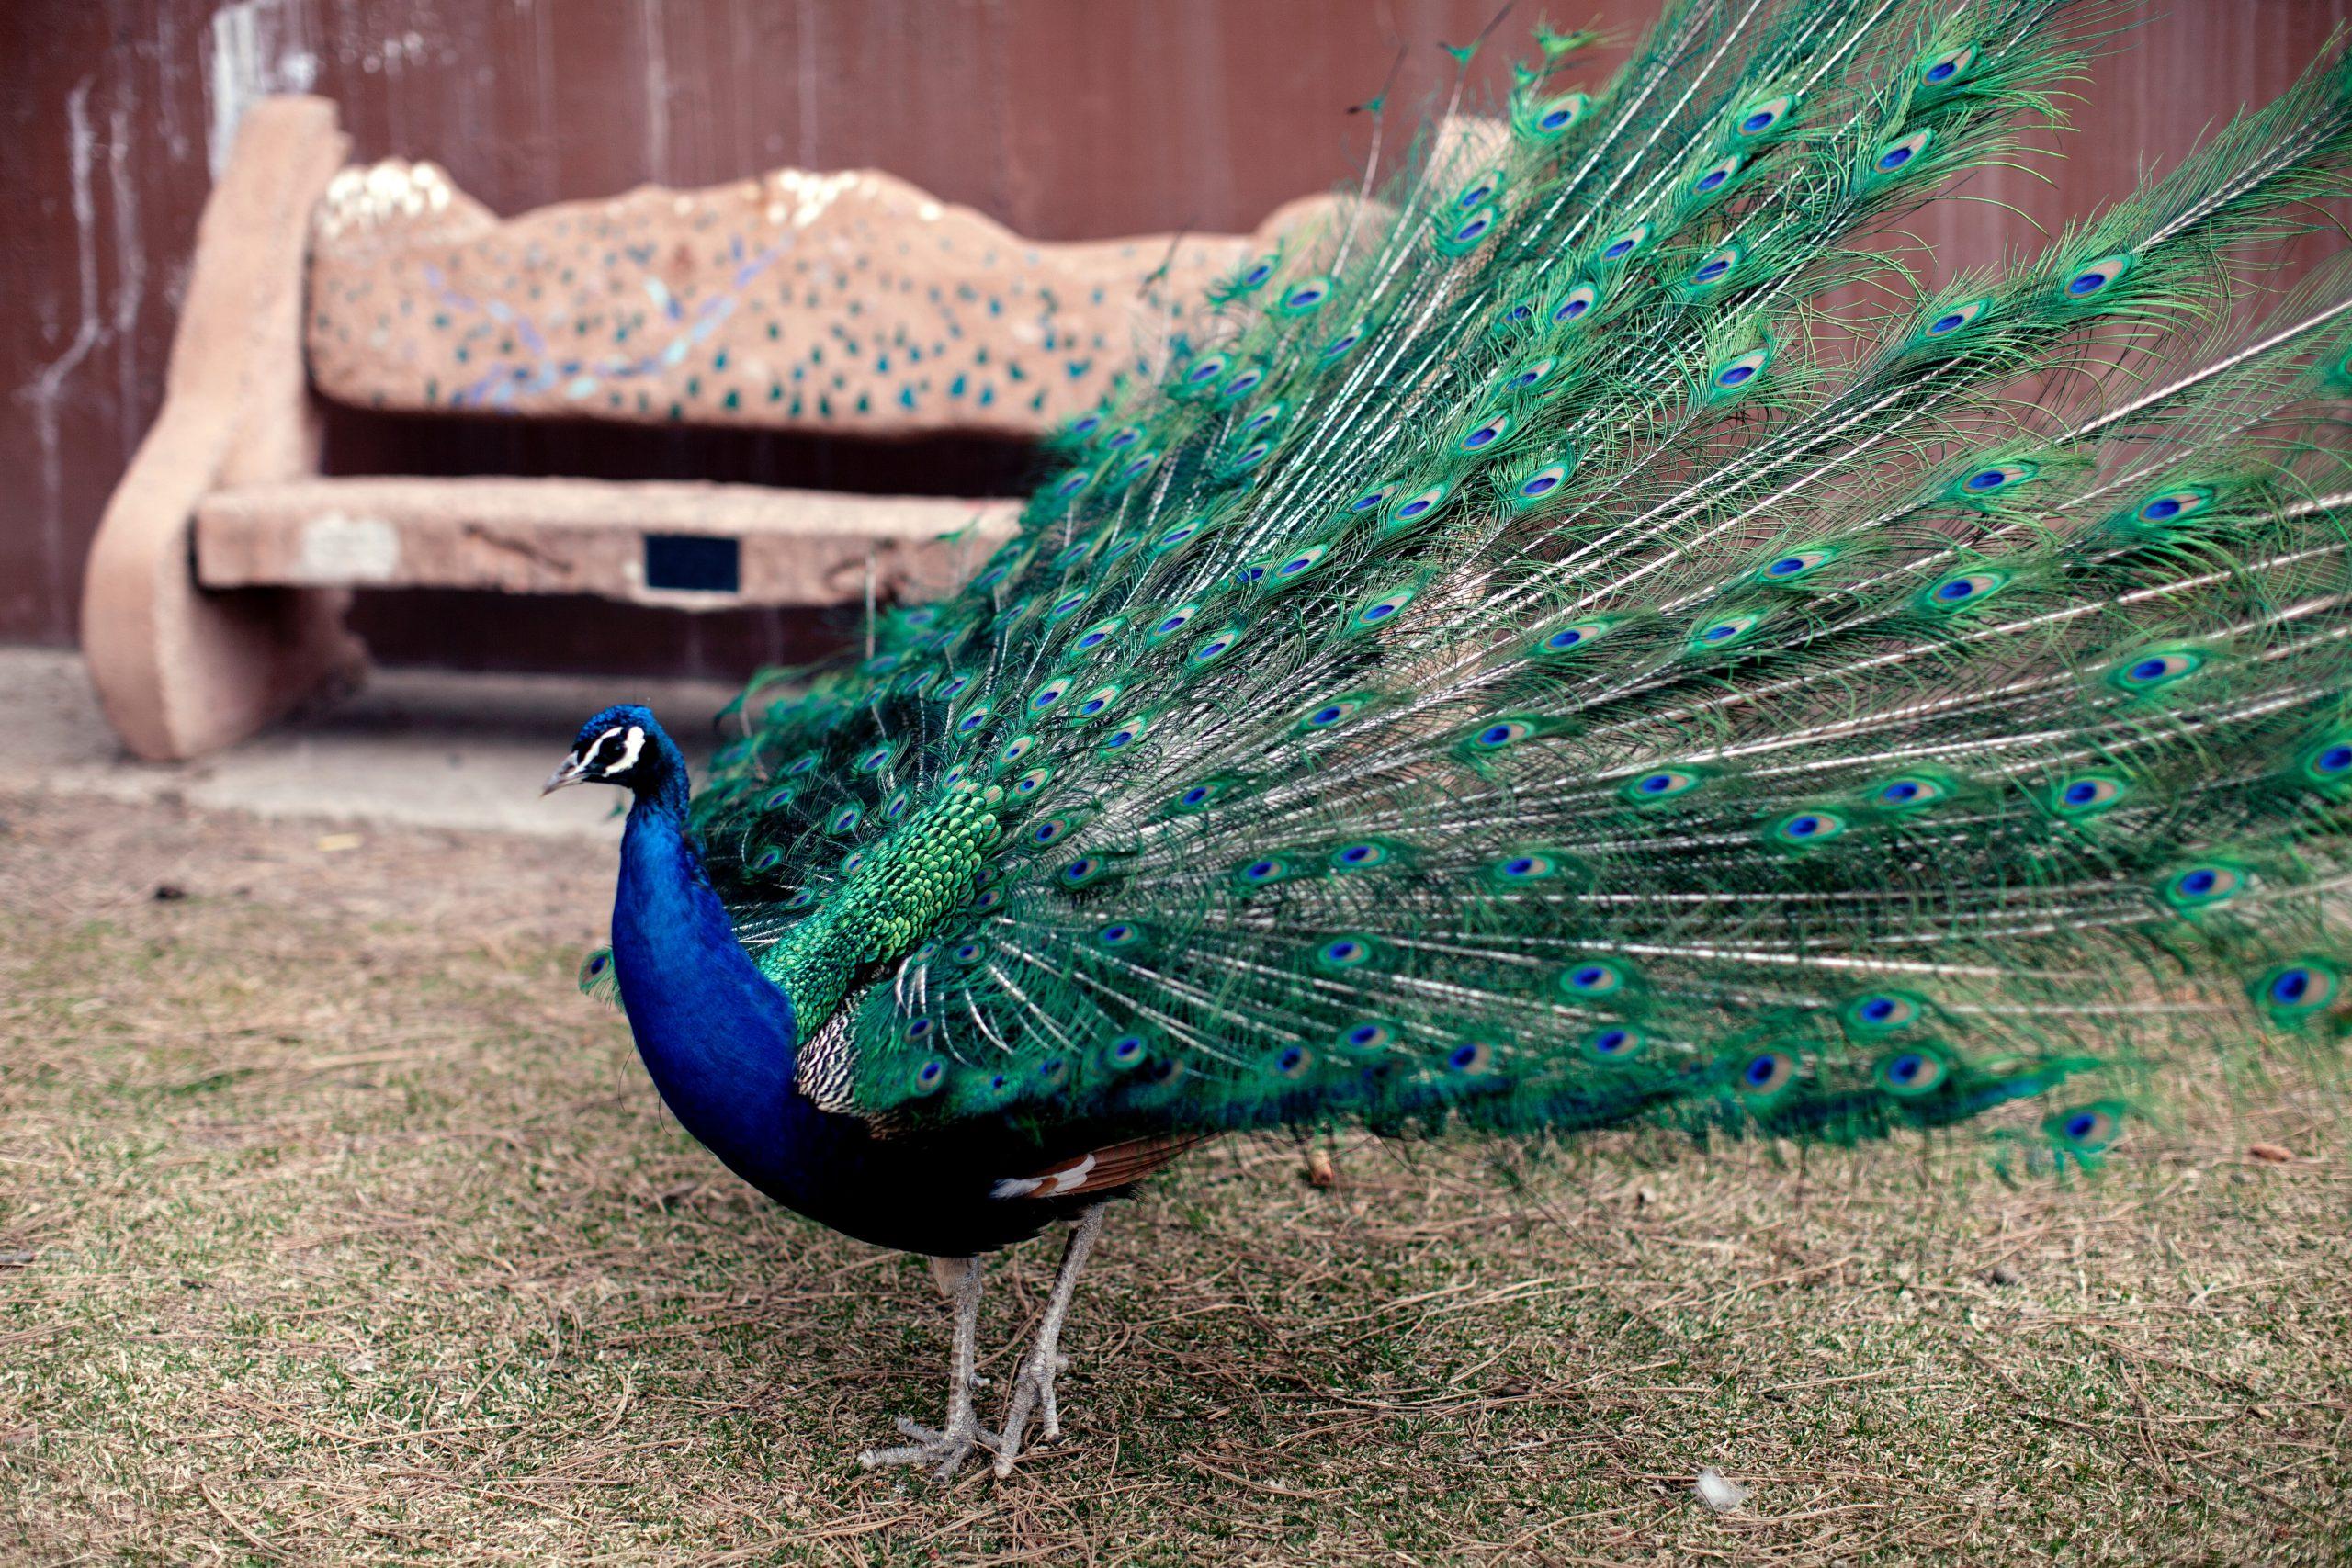 Essay on Peacock in Hindi